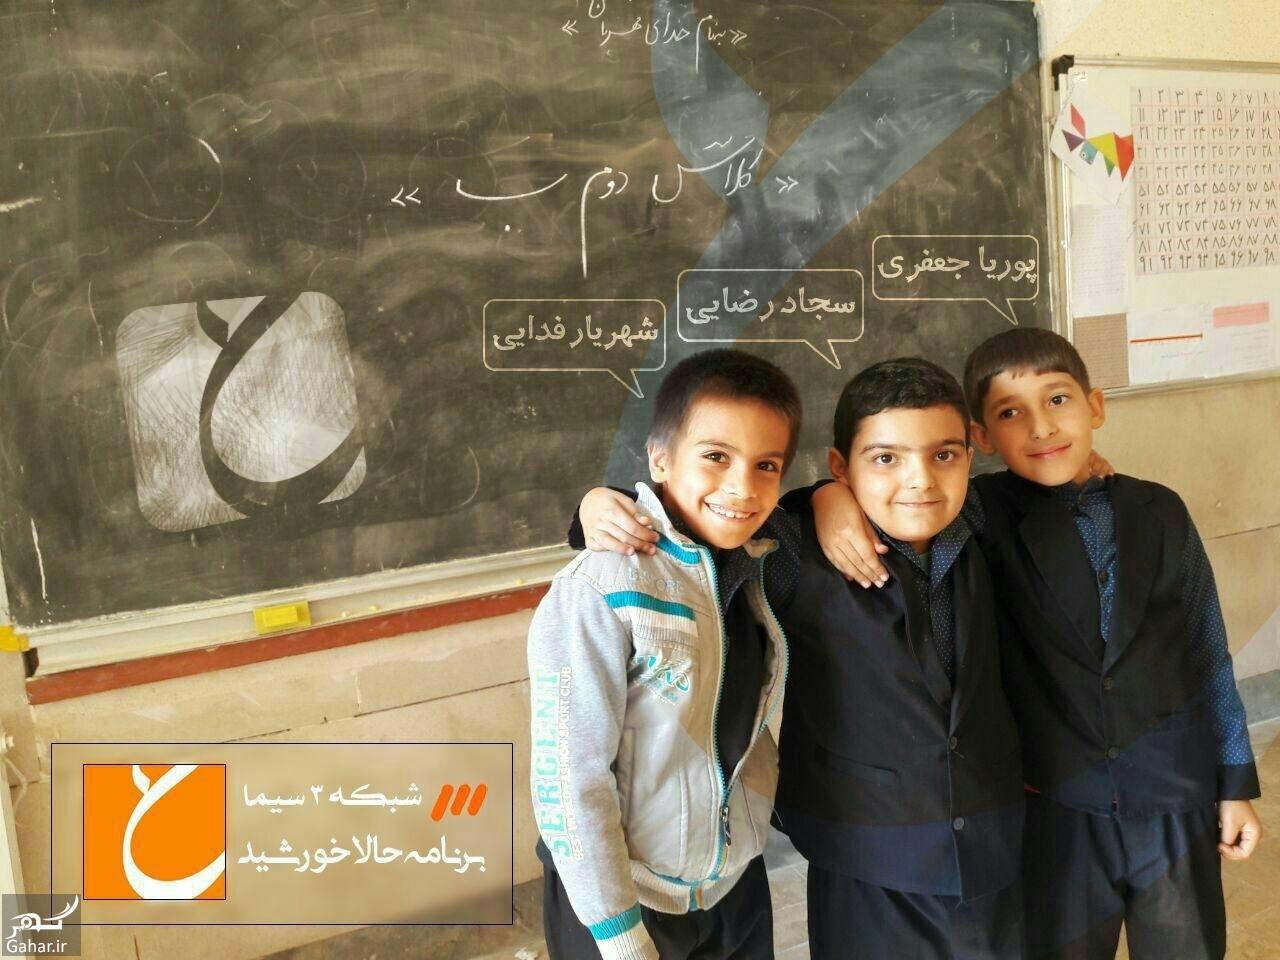 sajad rezaei عکس پوریا جعفری ، سجاد رضایی و شهریار فدایی از دبستان سیف